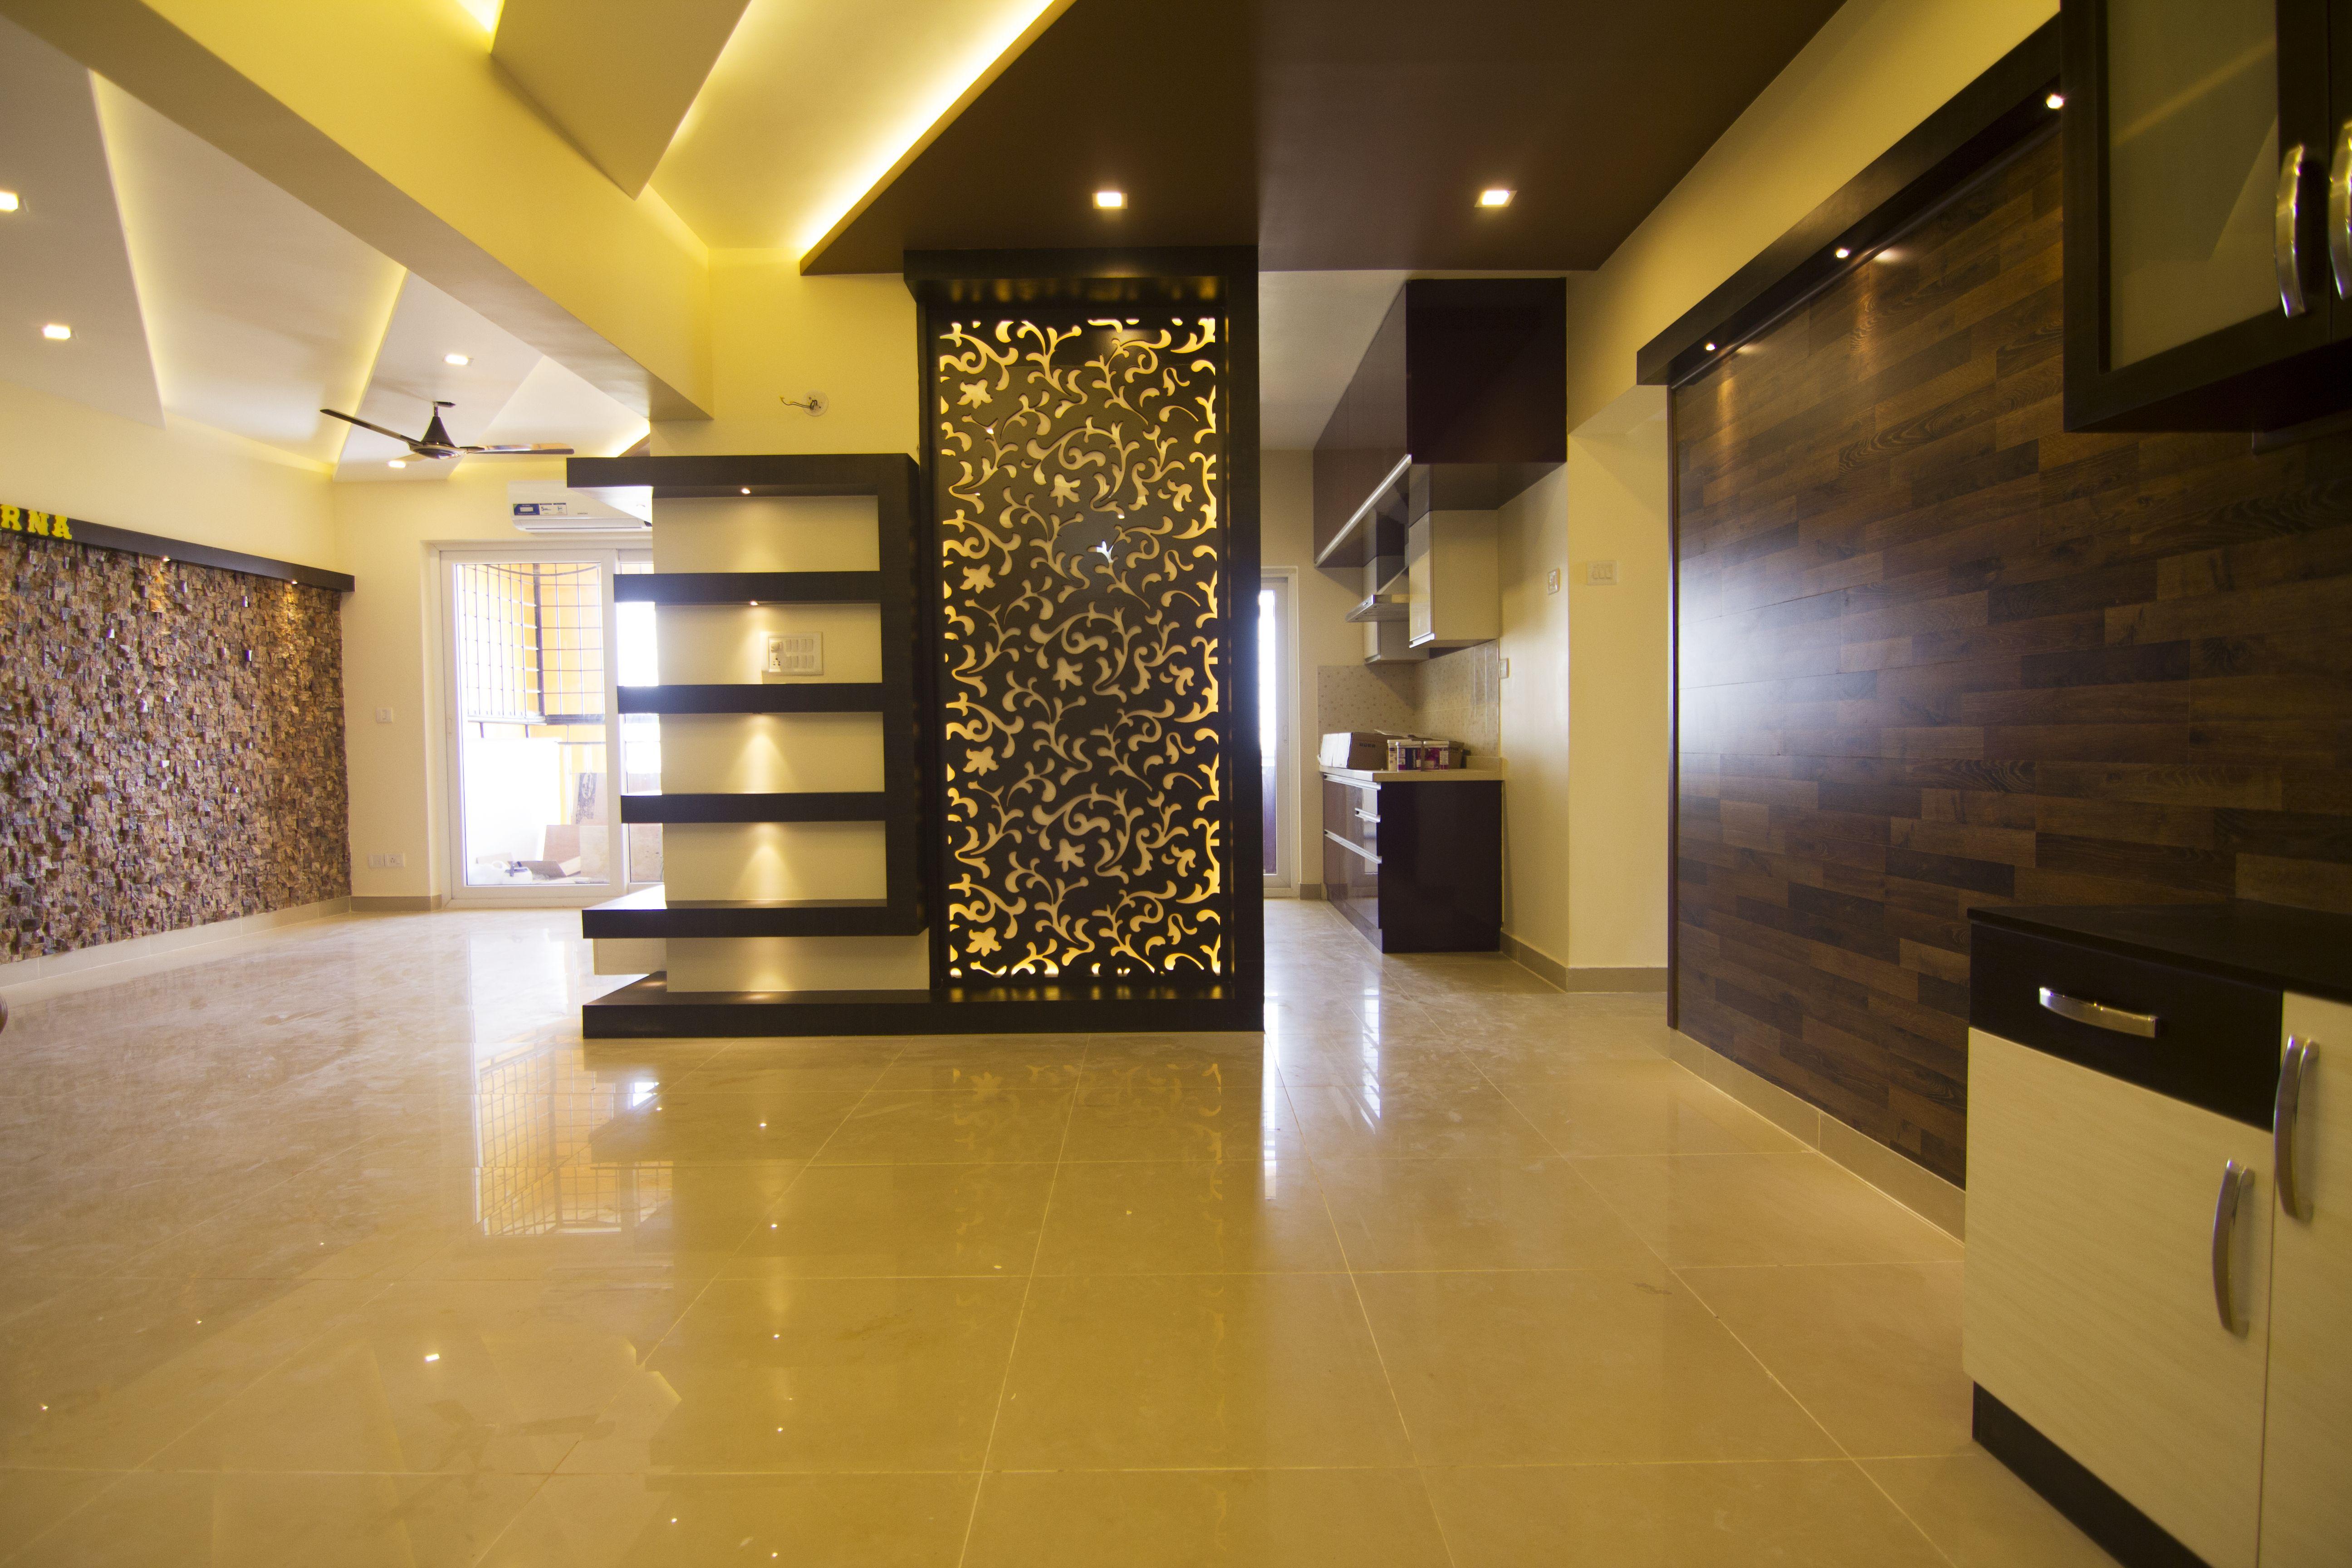 Dr Ravikumar S 3bhk Apartment Interiors Golden Grand Interior Flat Interior Design Flat Interior